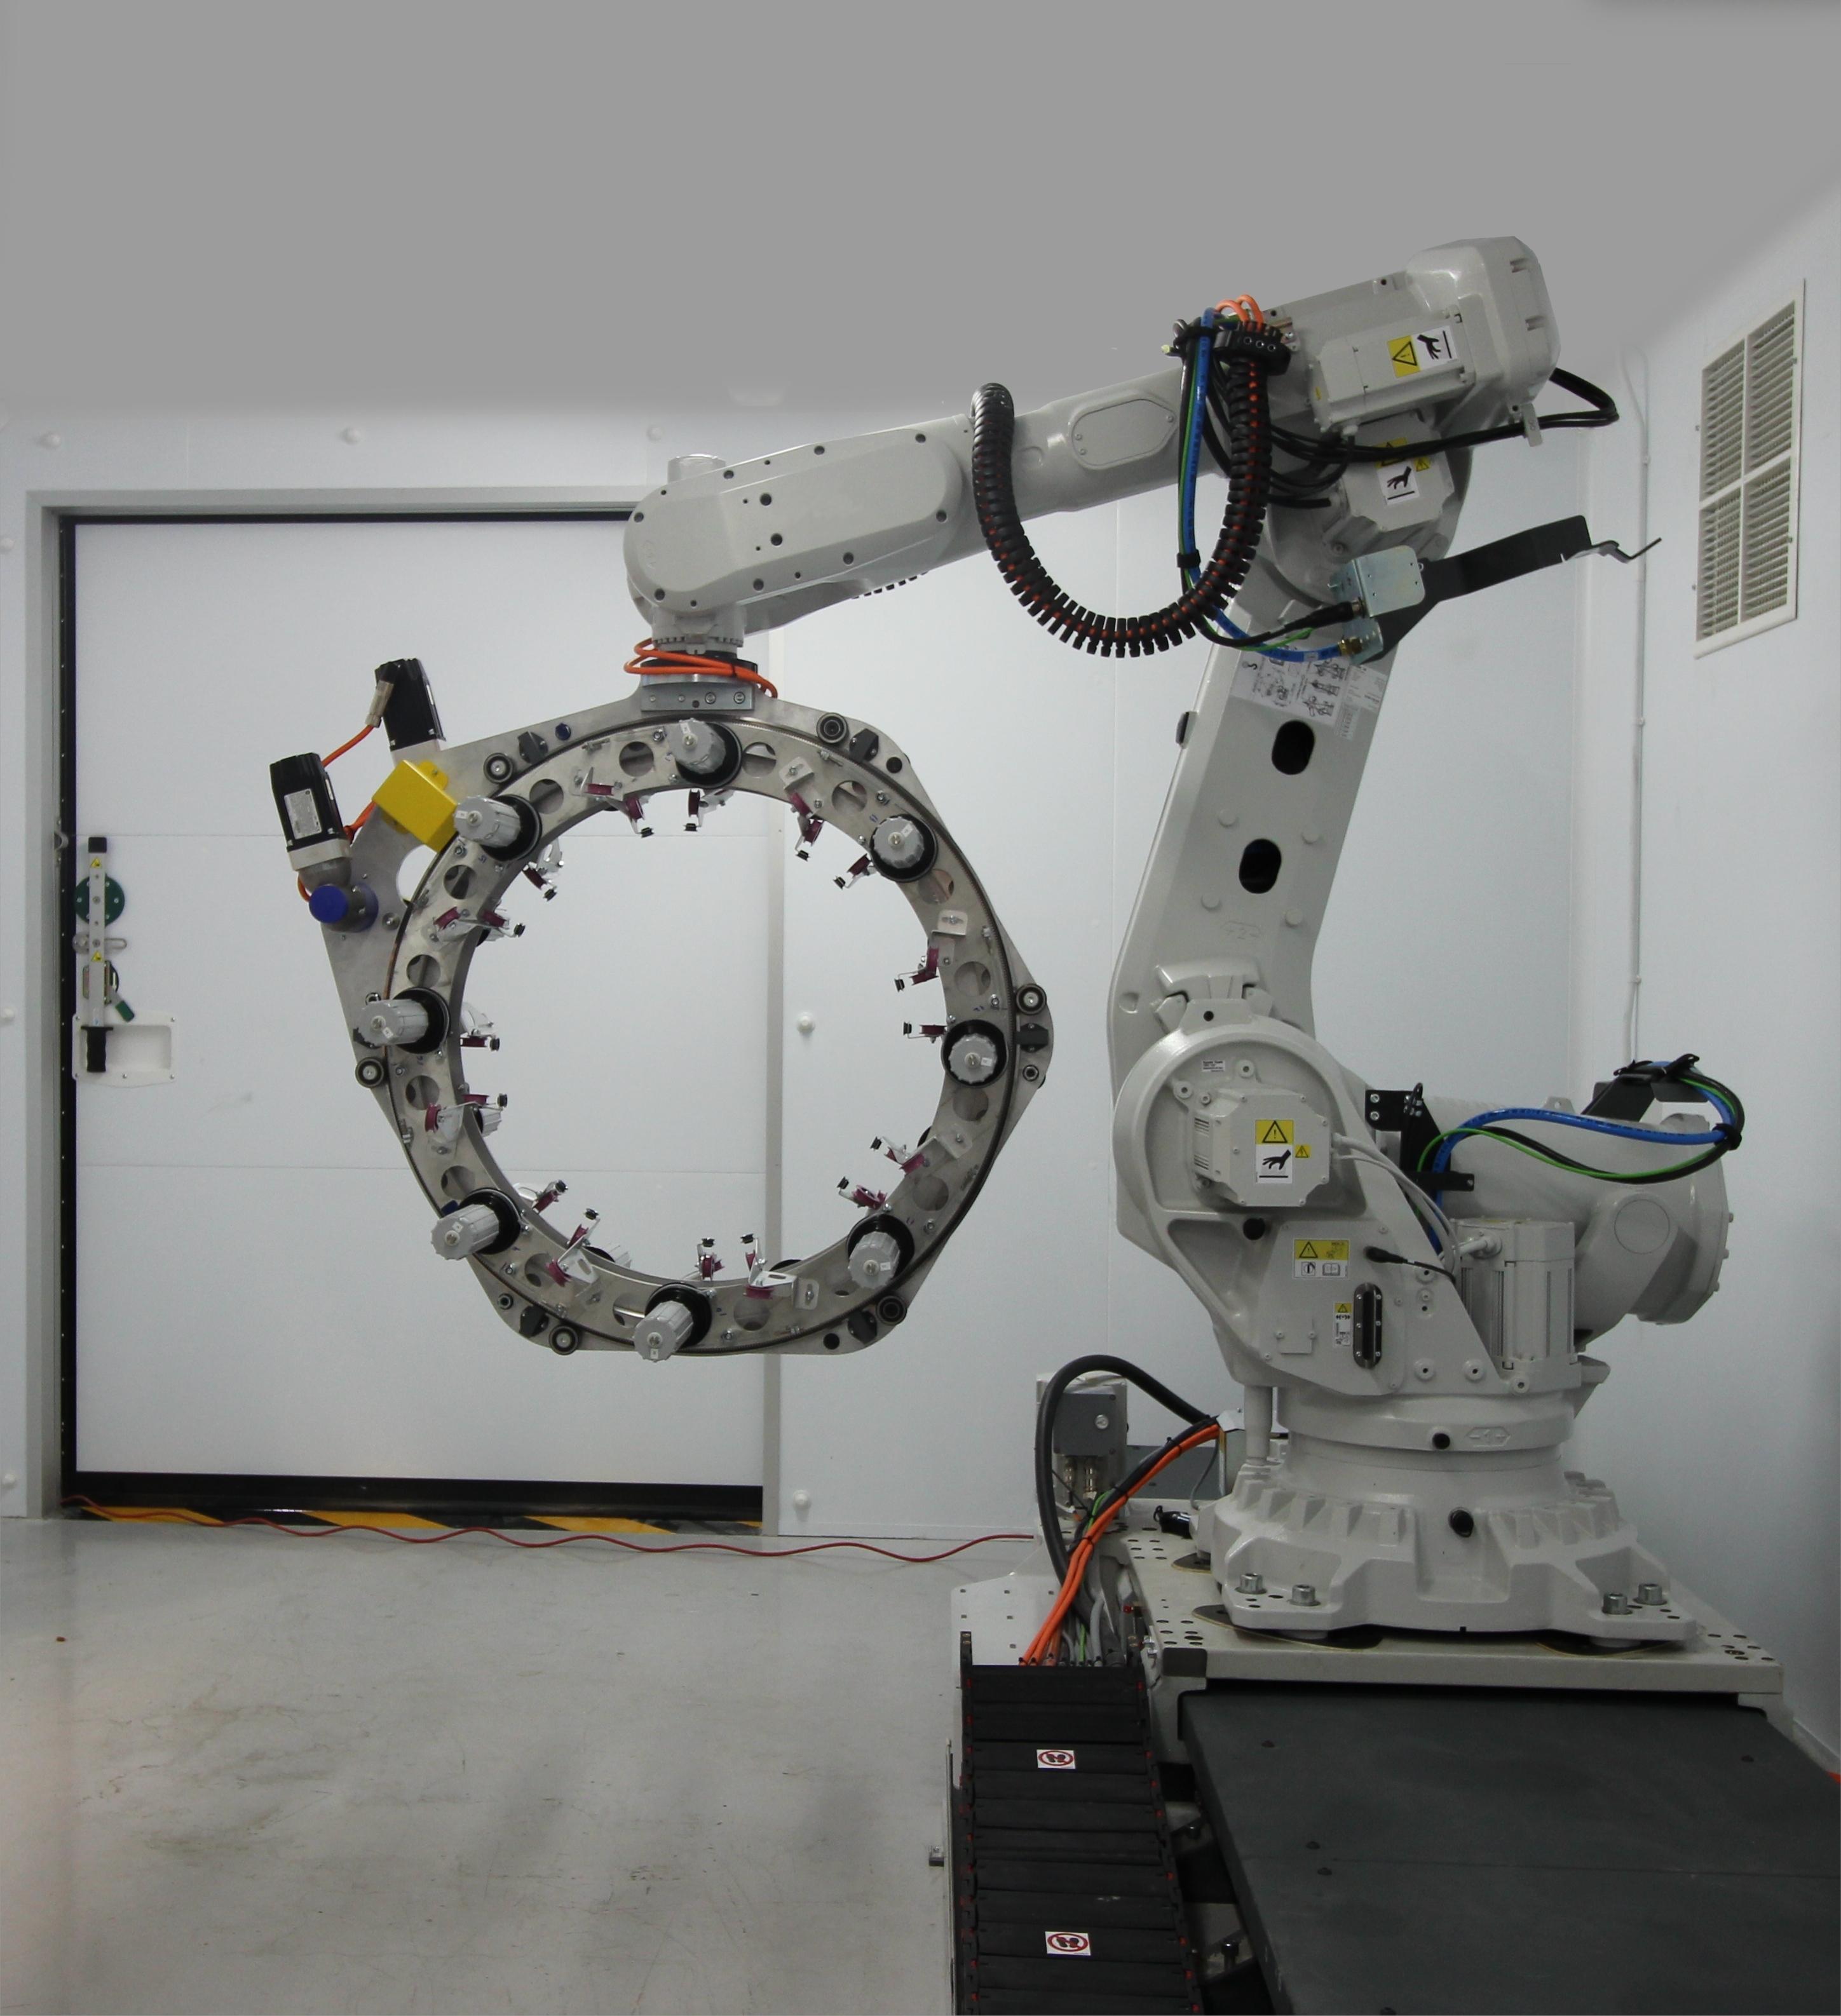 Cygnet Texkimp high speed 3D winder